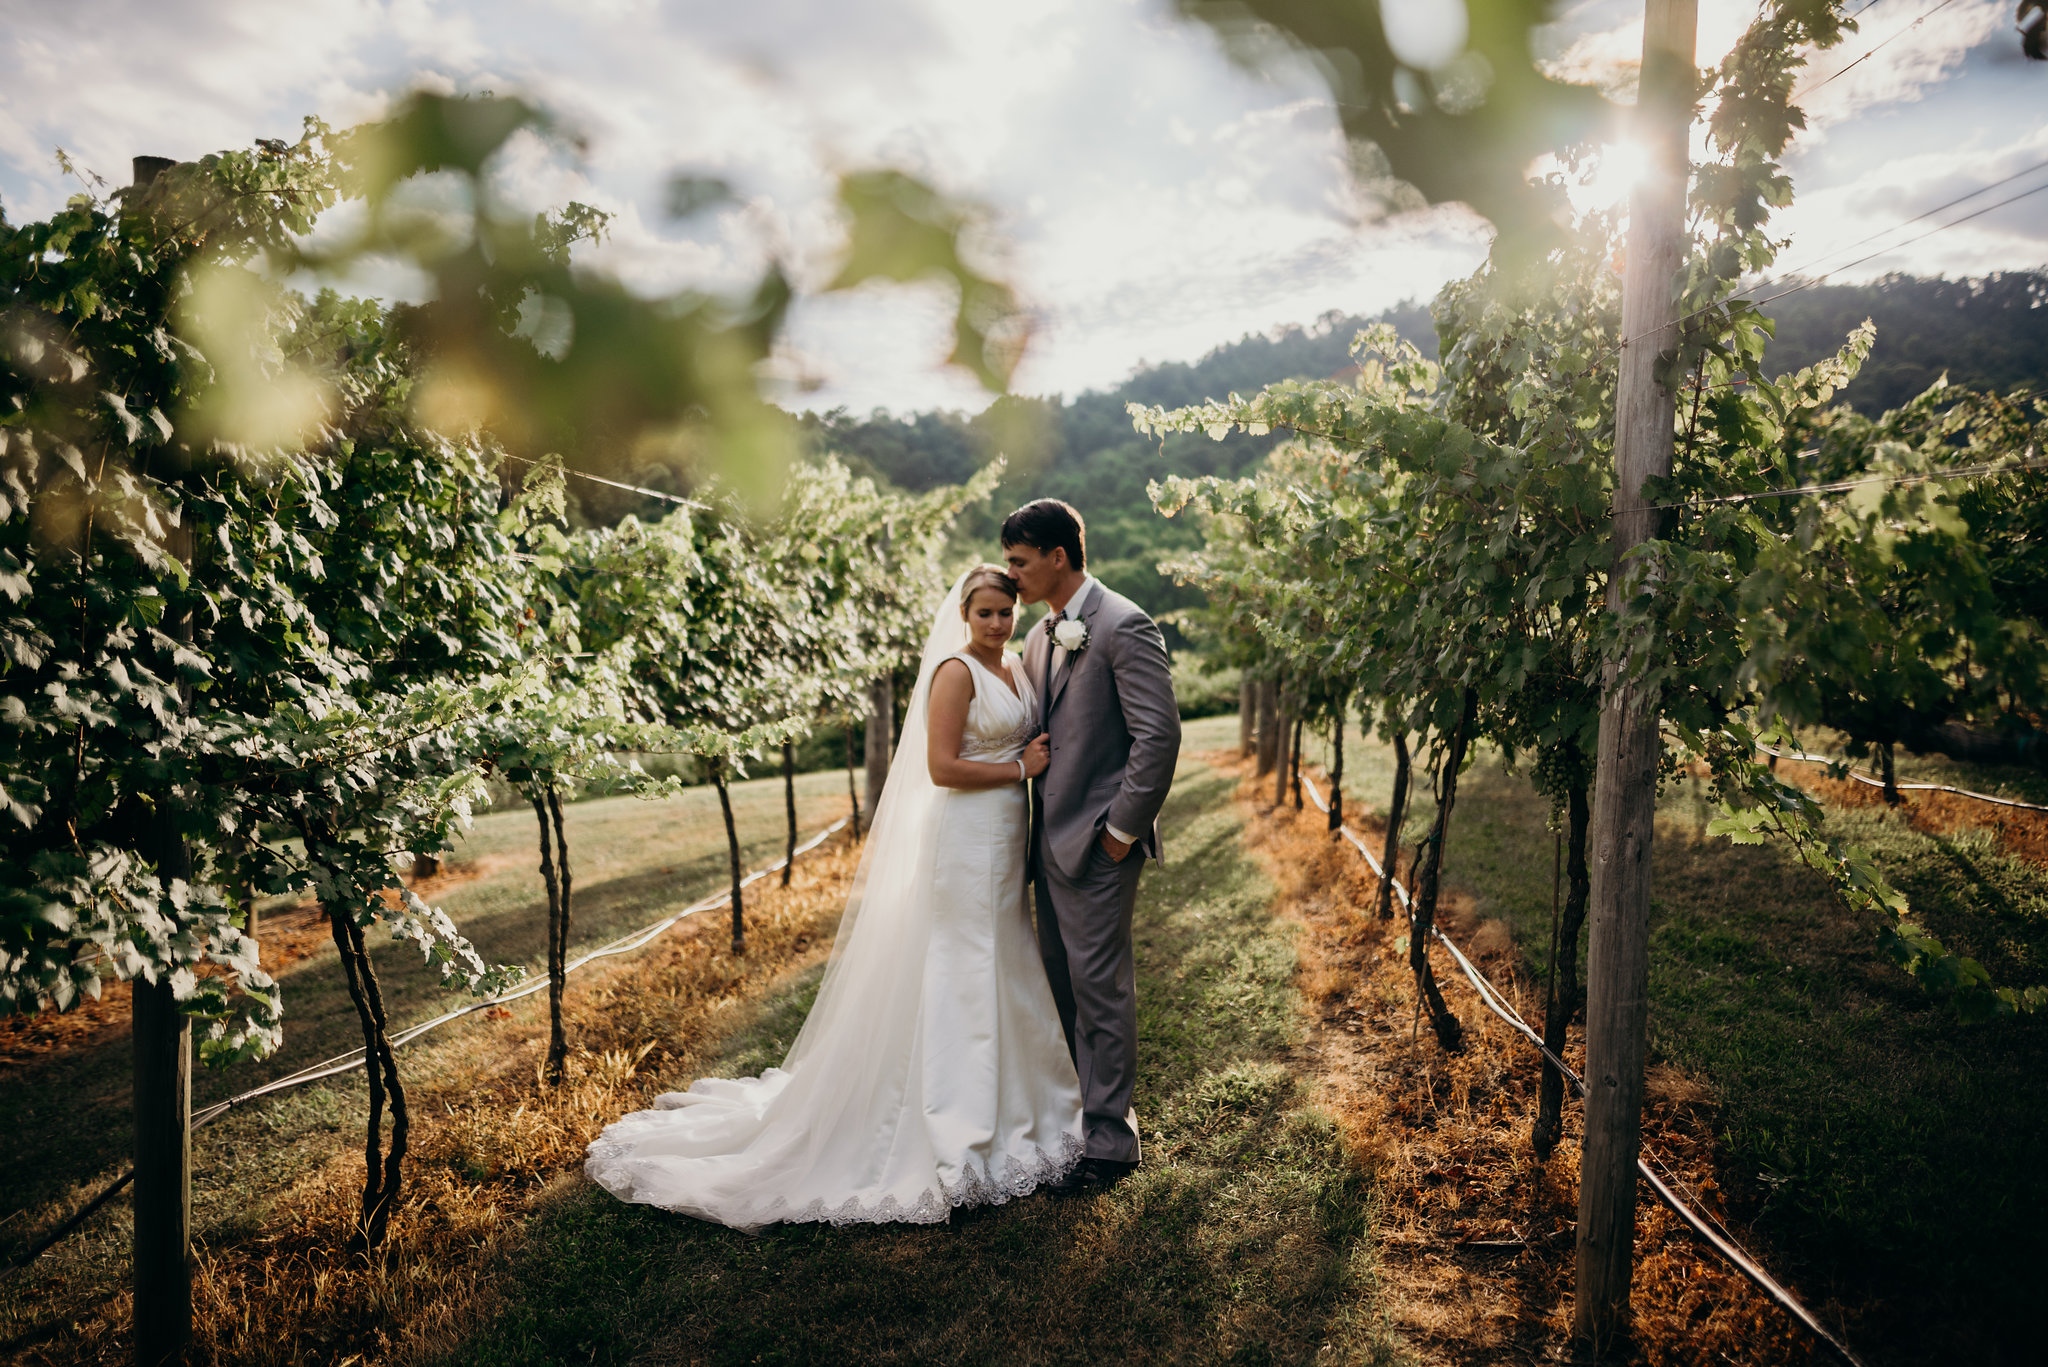 virginia-wedding-delfosse-vineyard-lindsey-paradiso-photography-6959 (1).jpg